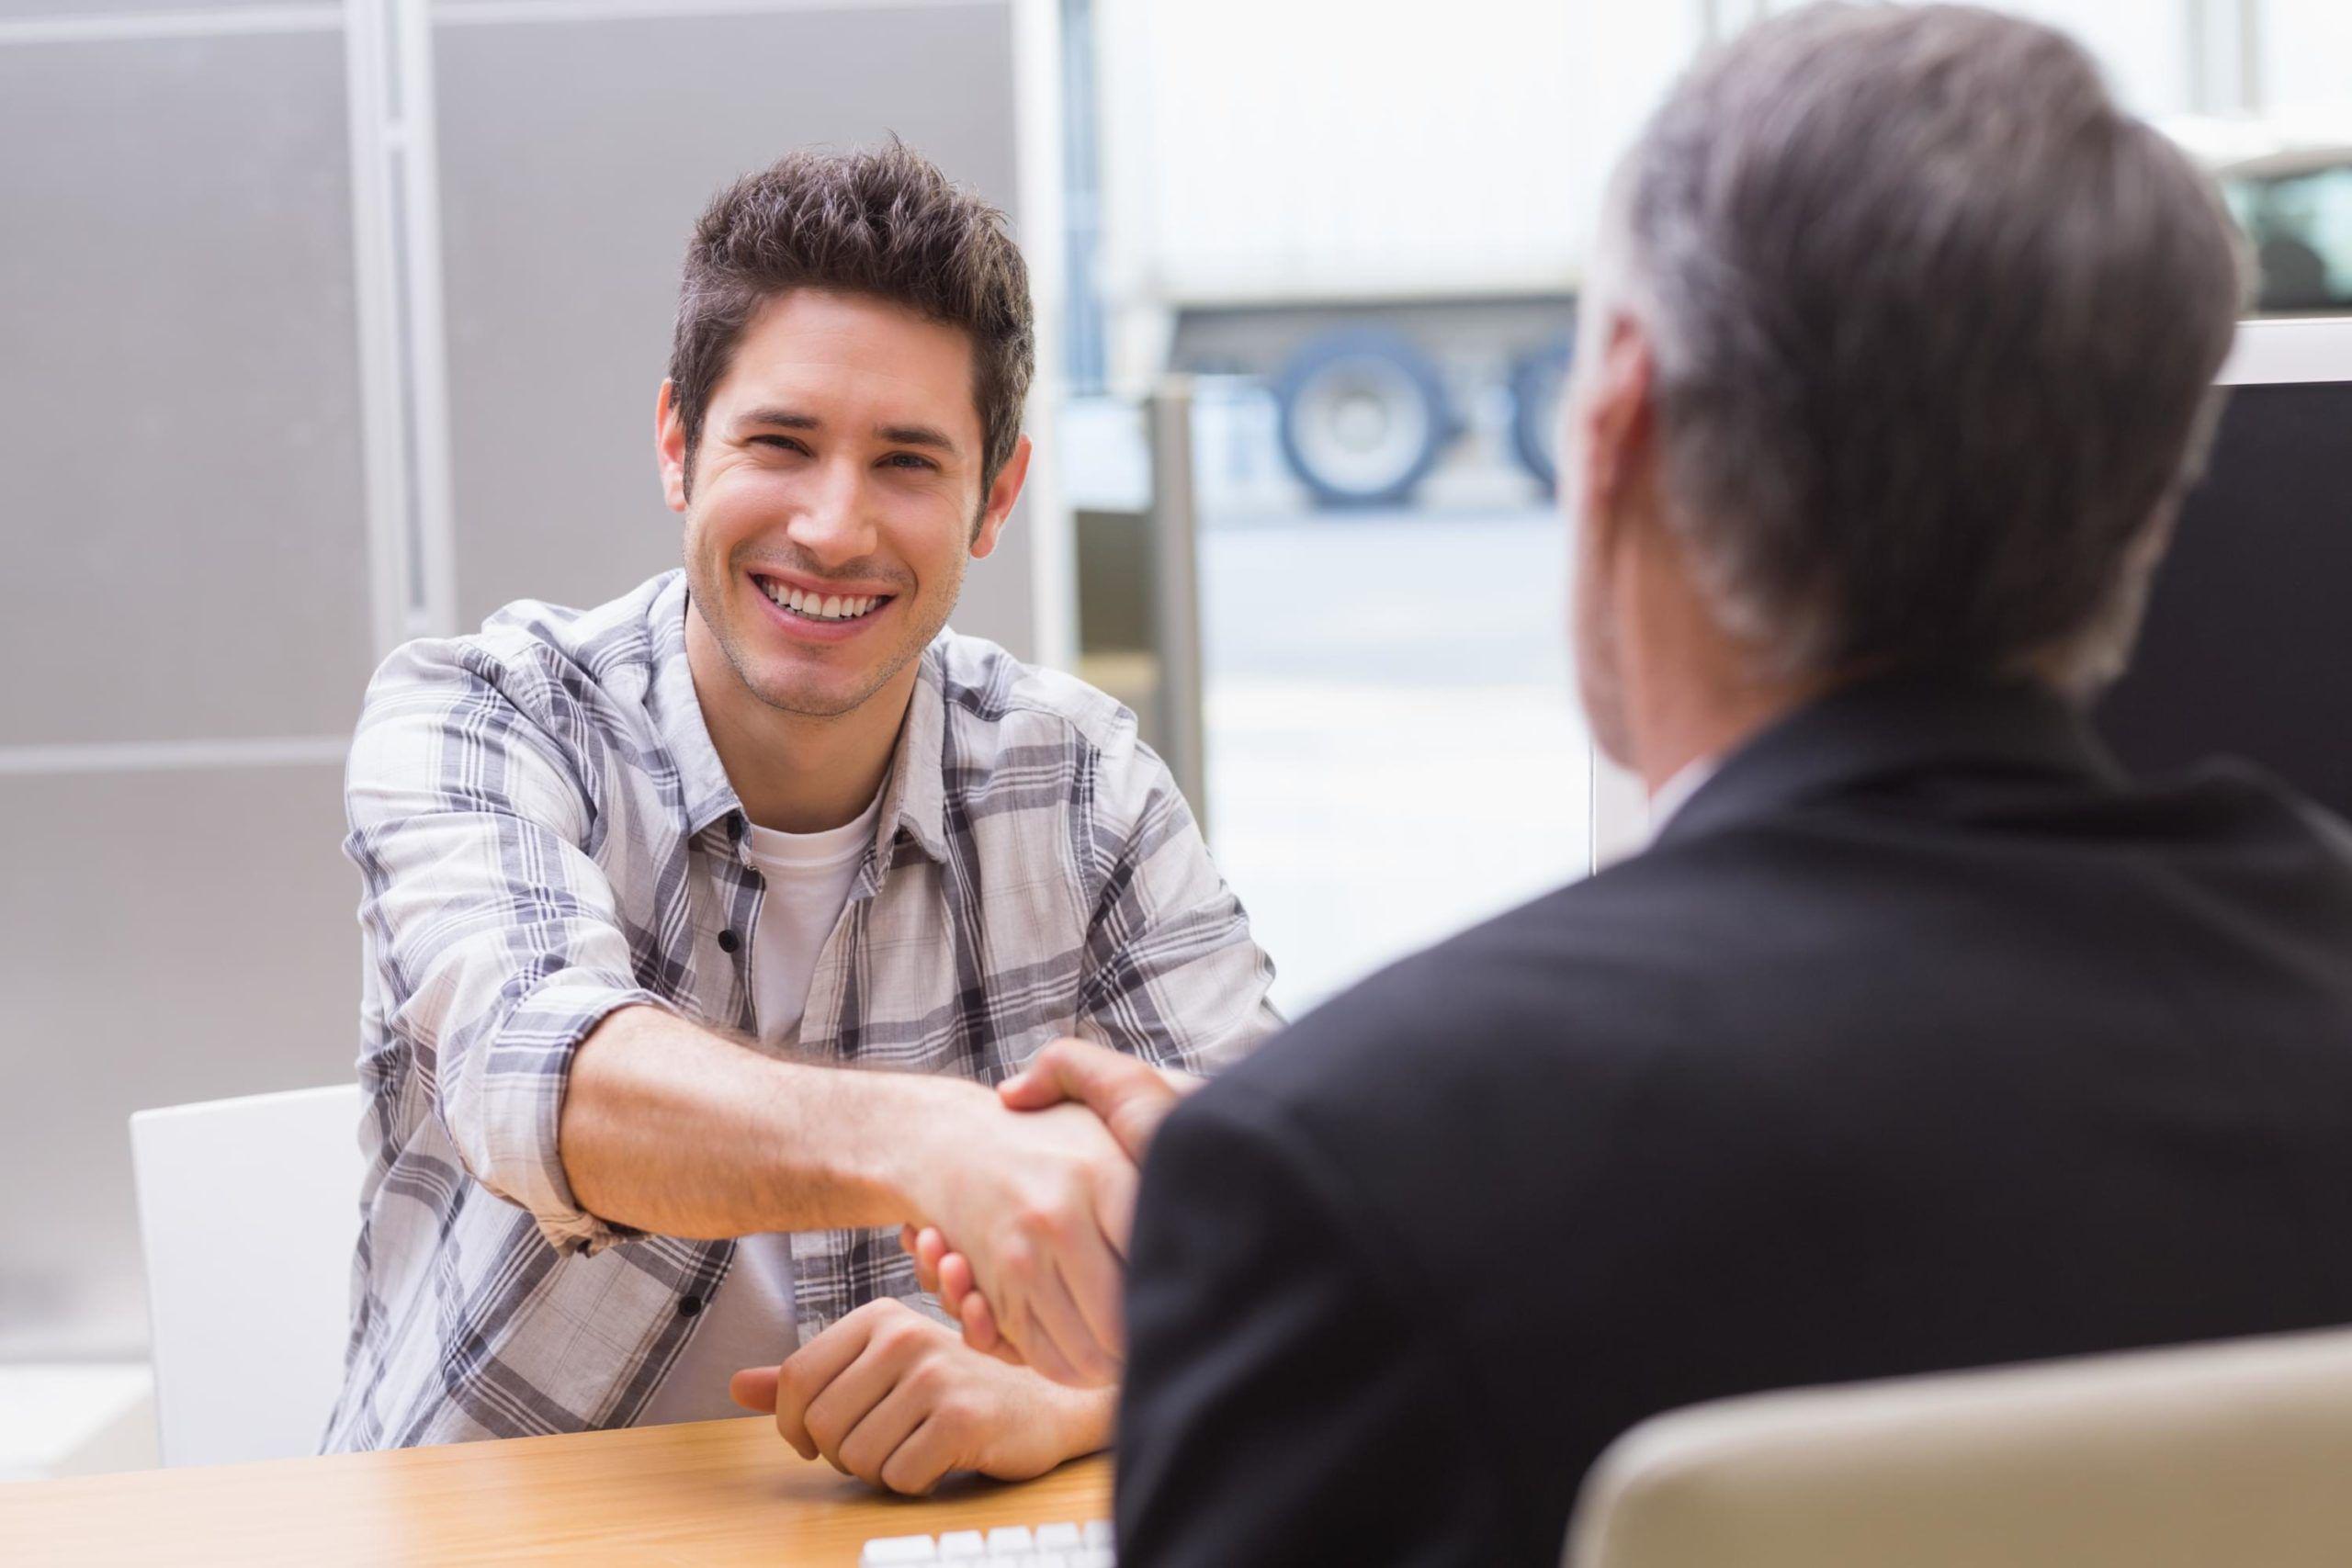 Smiling customer shaking a salesman hand at new car showroom